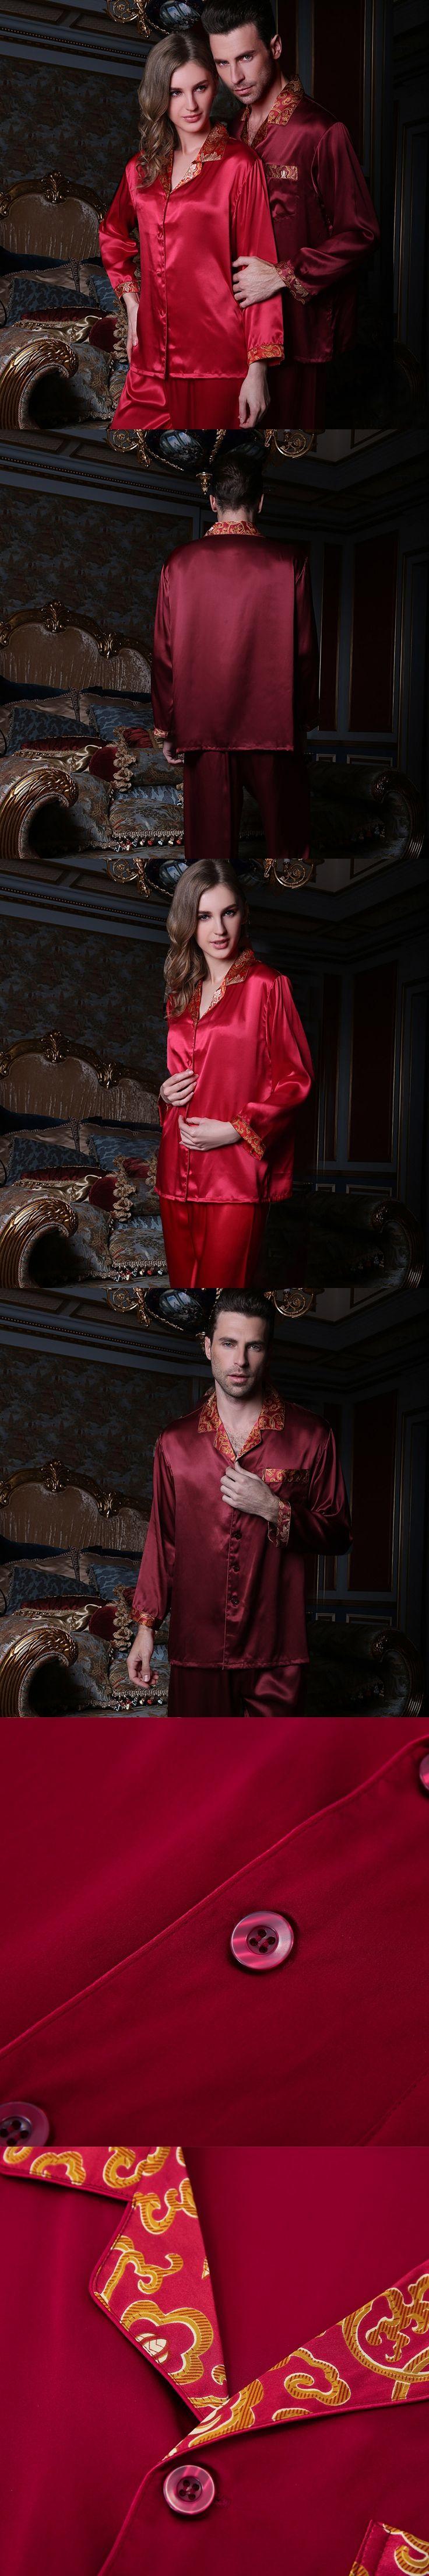 Autumn Men and Women lovers Silk Pajamas Sleepwears Long-sleeve 5A 100% Mulberry Silk Pajama Sets Free Shipping